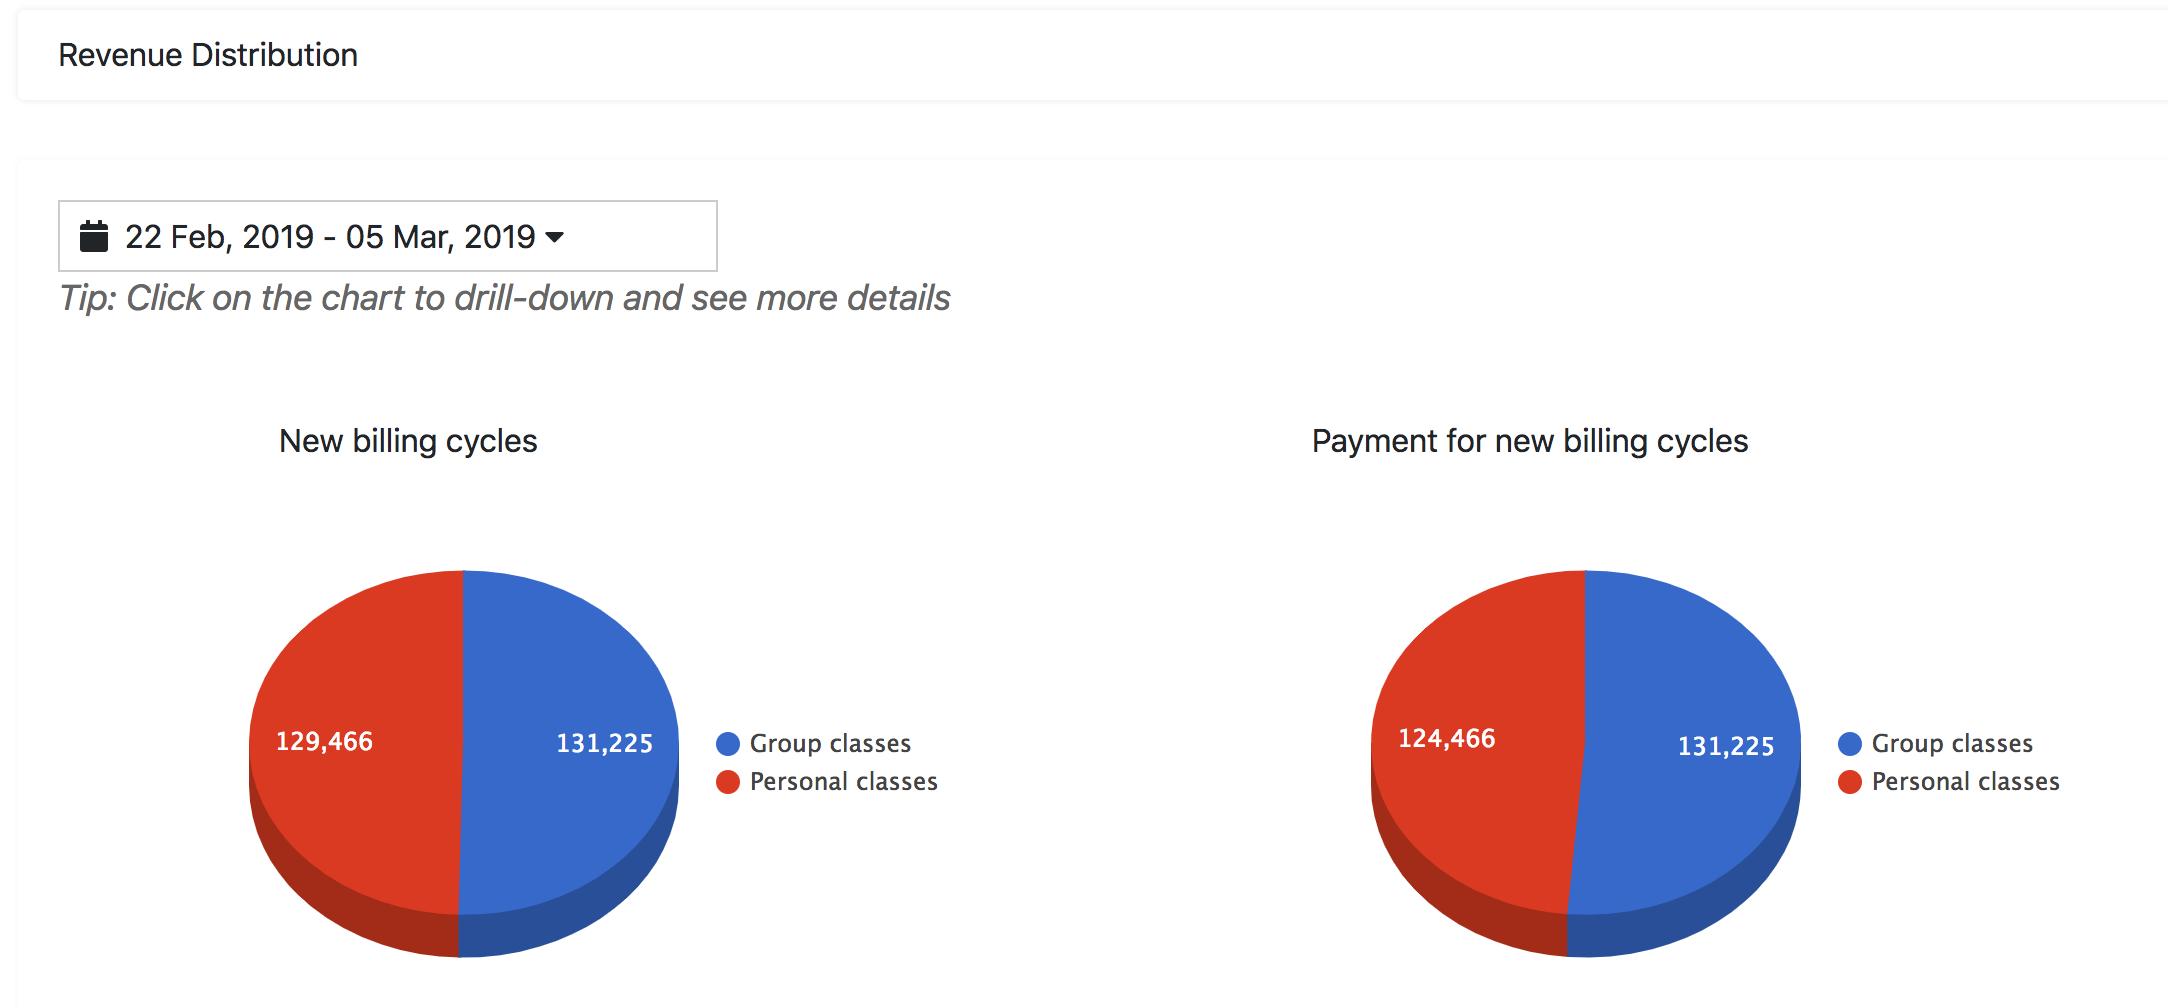 Revenue_Distribution___Chaitanya_Wellnes___.png